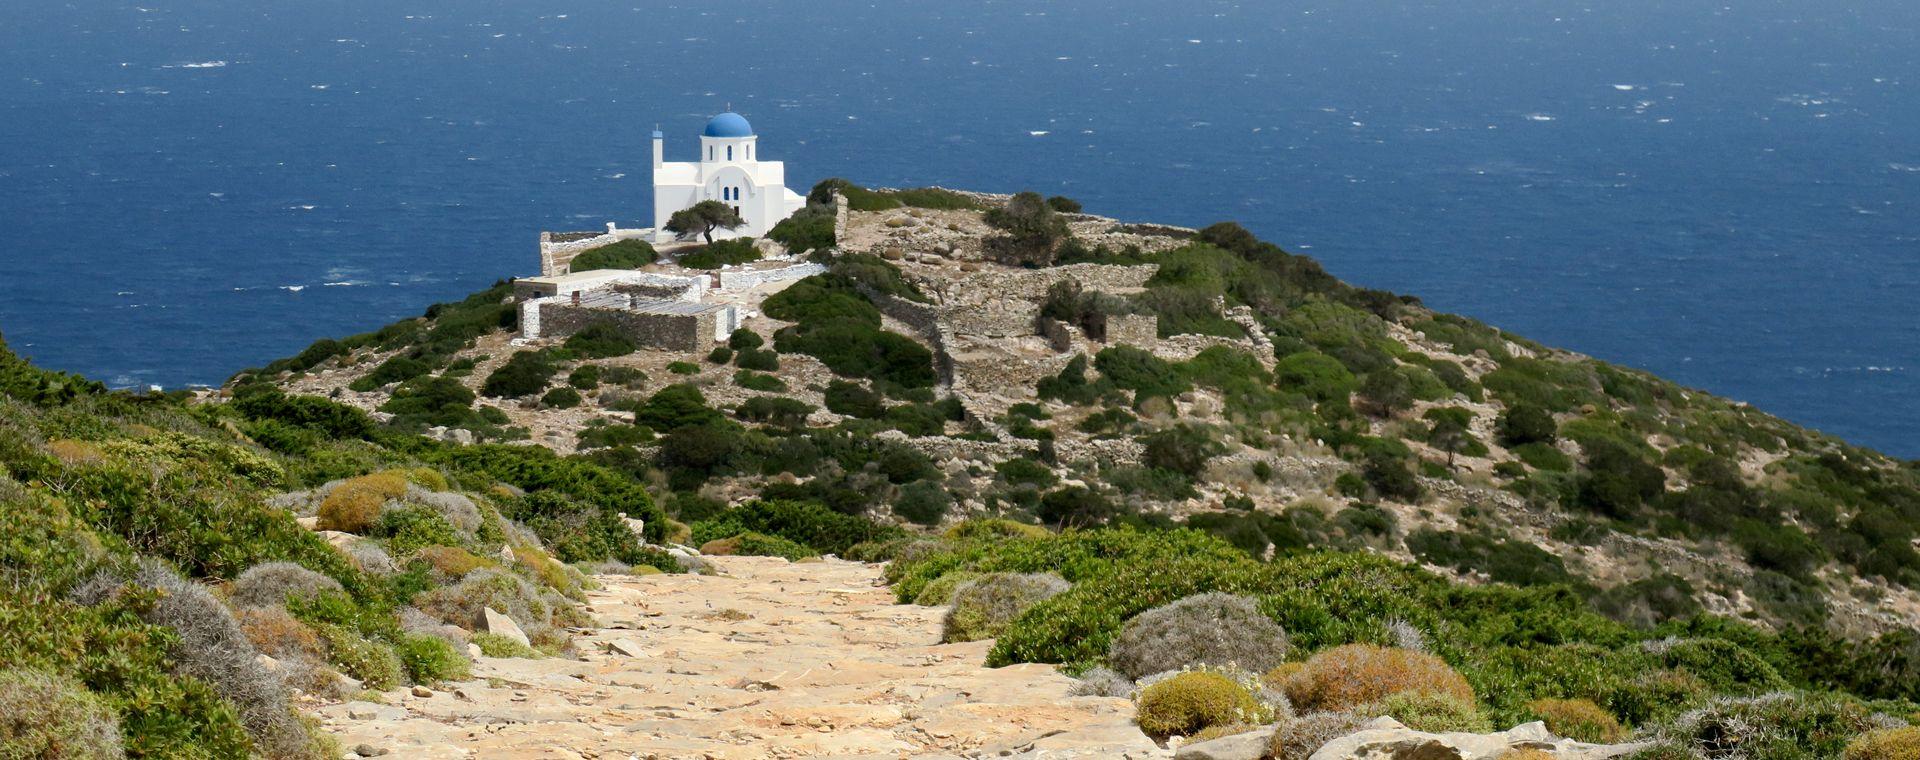 Voyage à pied : Les Cyclades : Naxos, Amorgos et Santorin